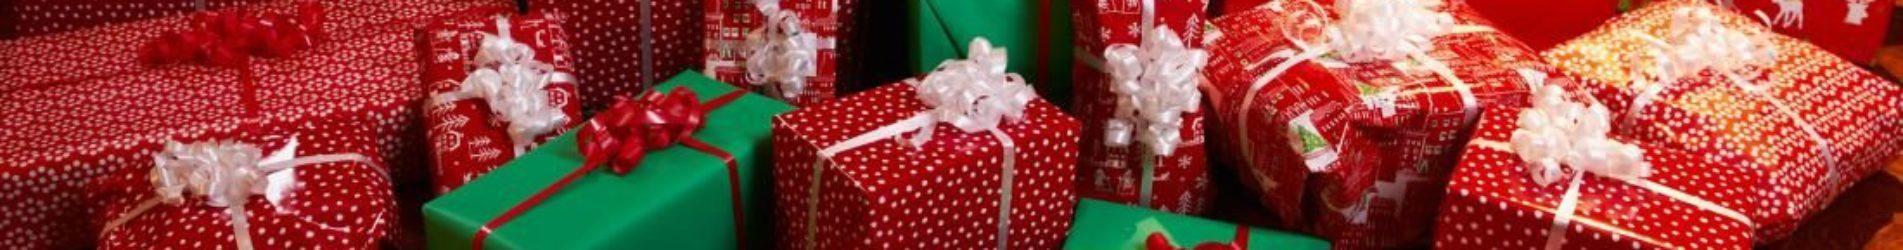 cropped-presents.jpg